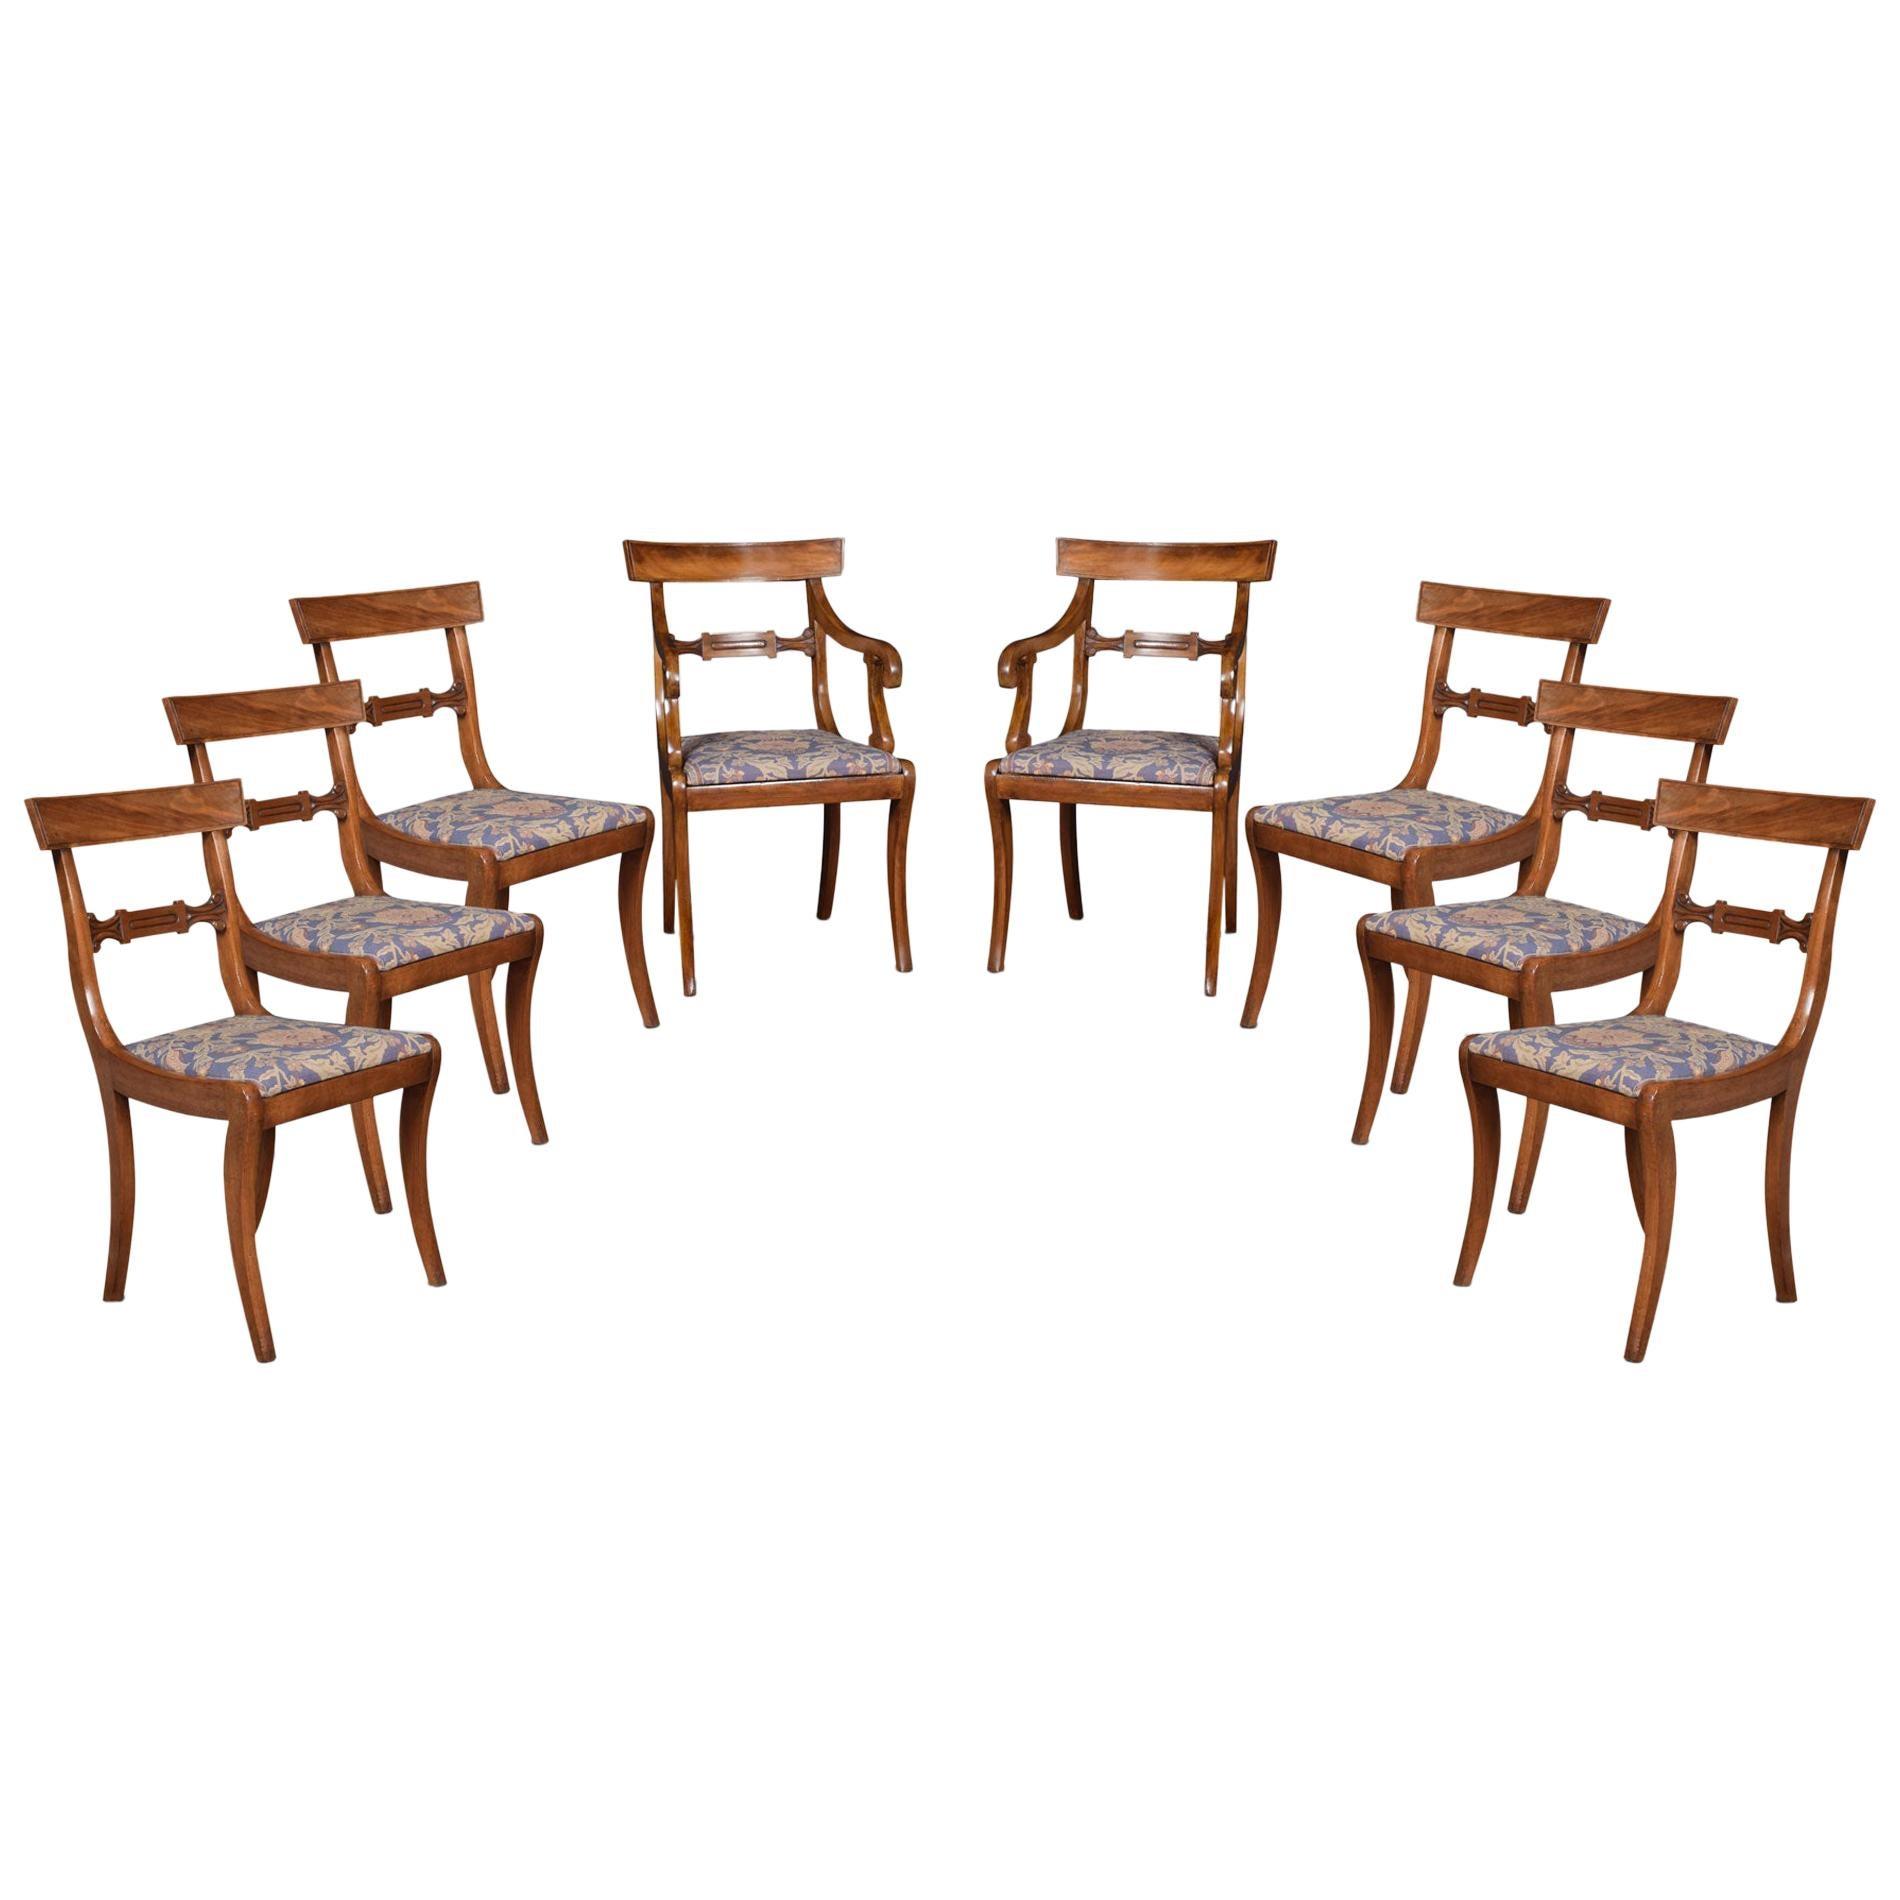 Eight Regency Mahogany Dining Chairs